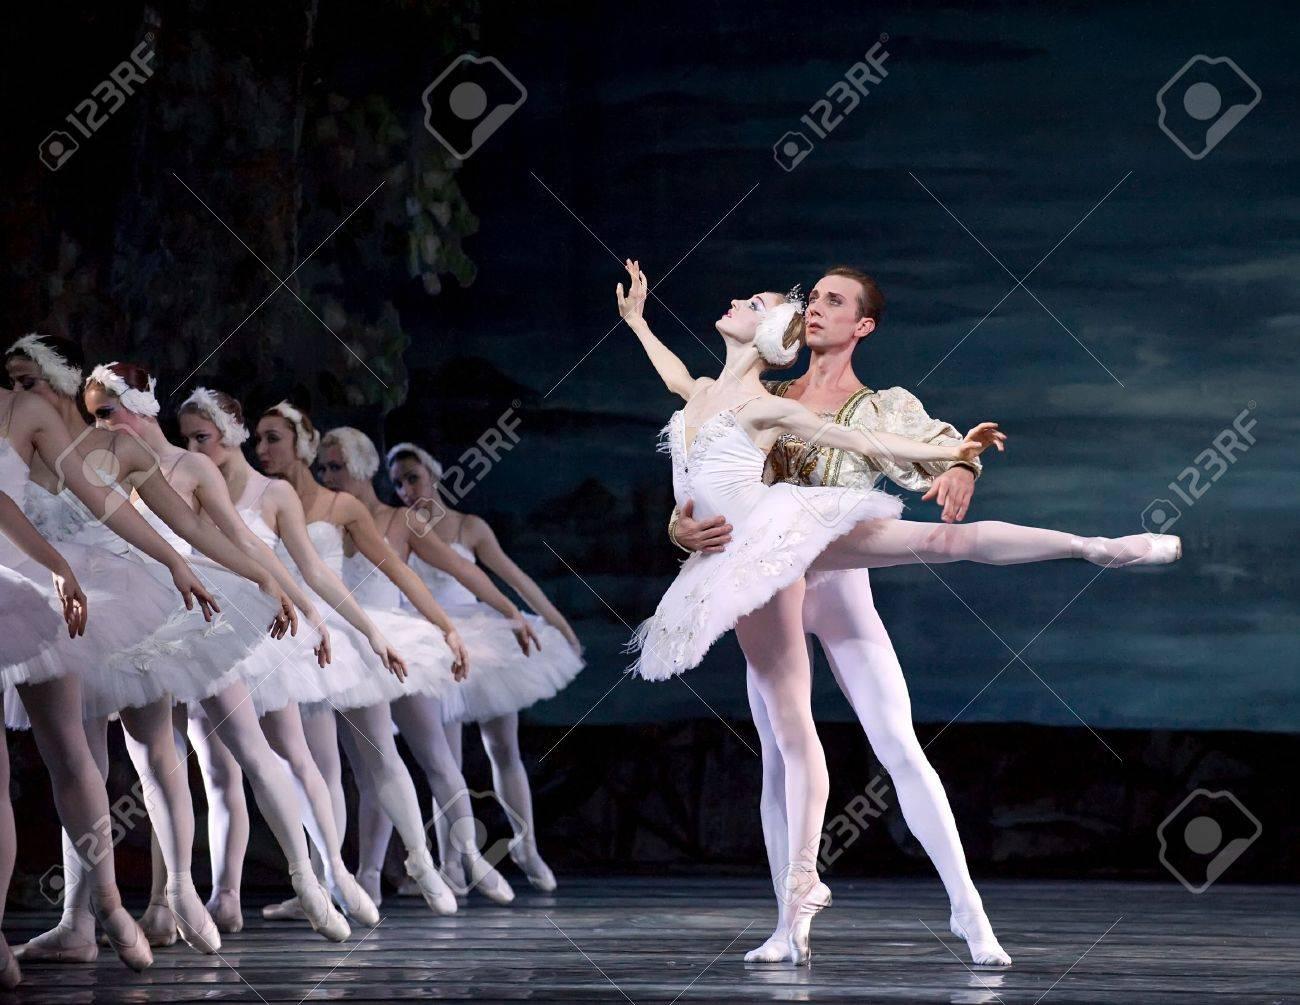 Swan Lake ballet performed by Russian royal ballet at Jinsha theater December 24, 2008 in Chengdu, China. Stock Photo - 9205303